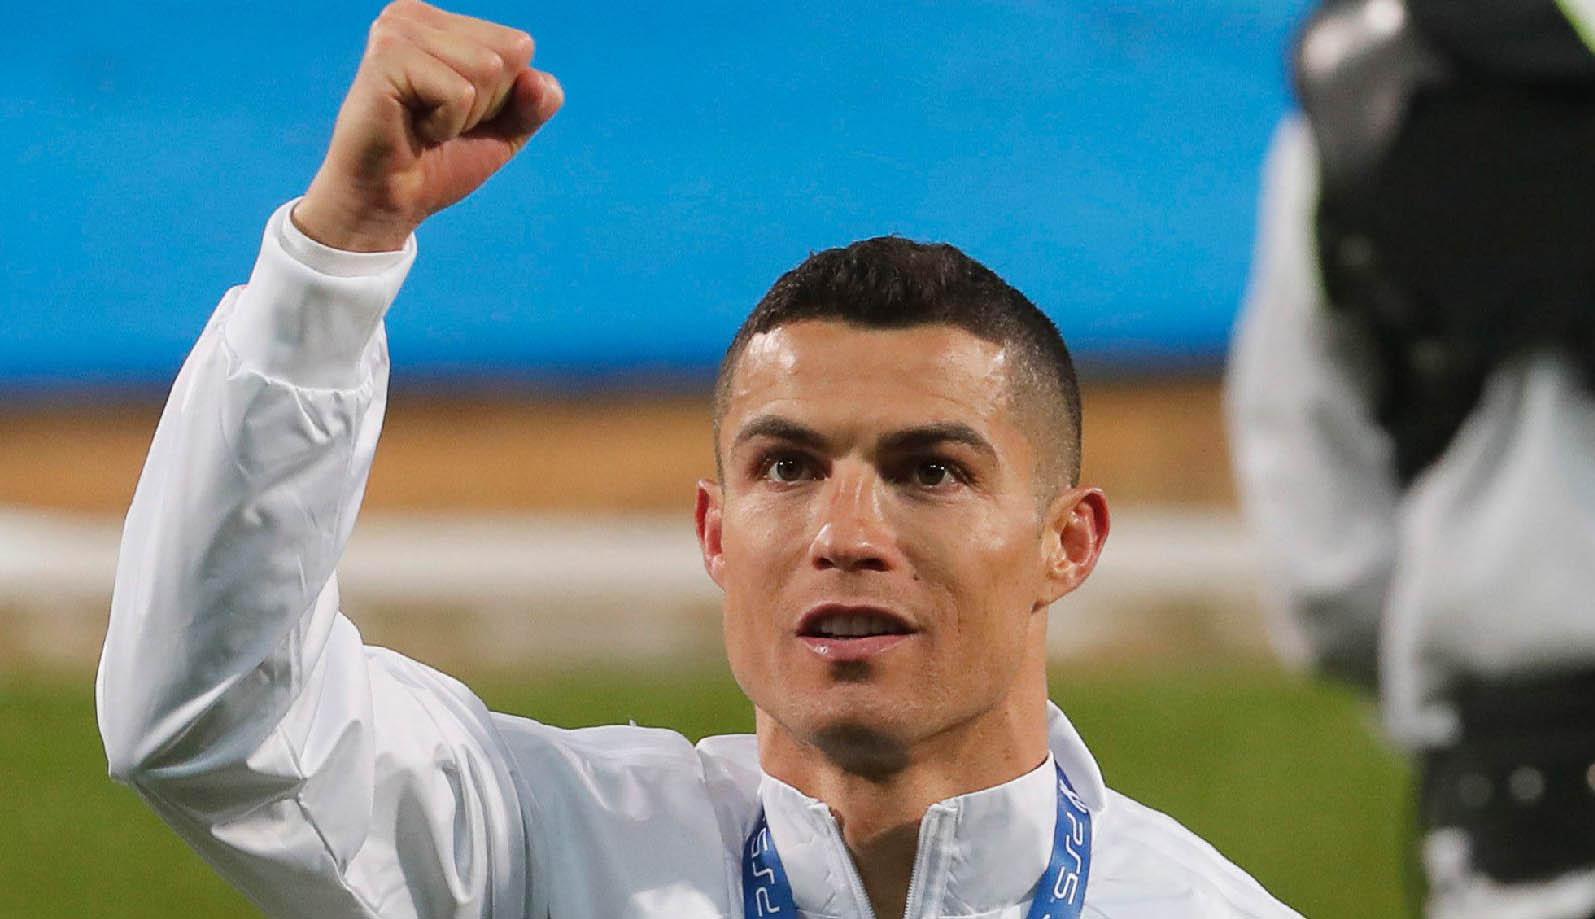 Ronaldo ontja a gólokat